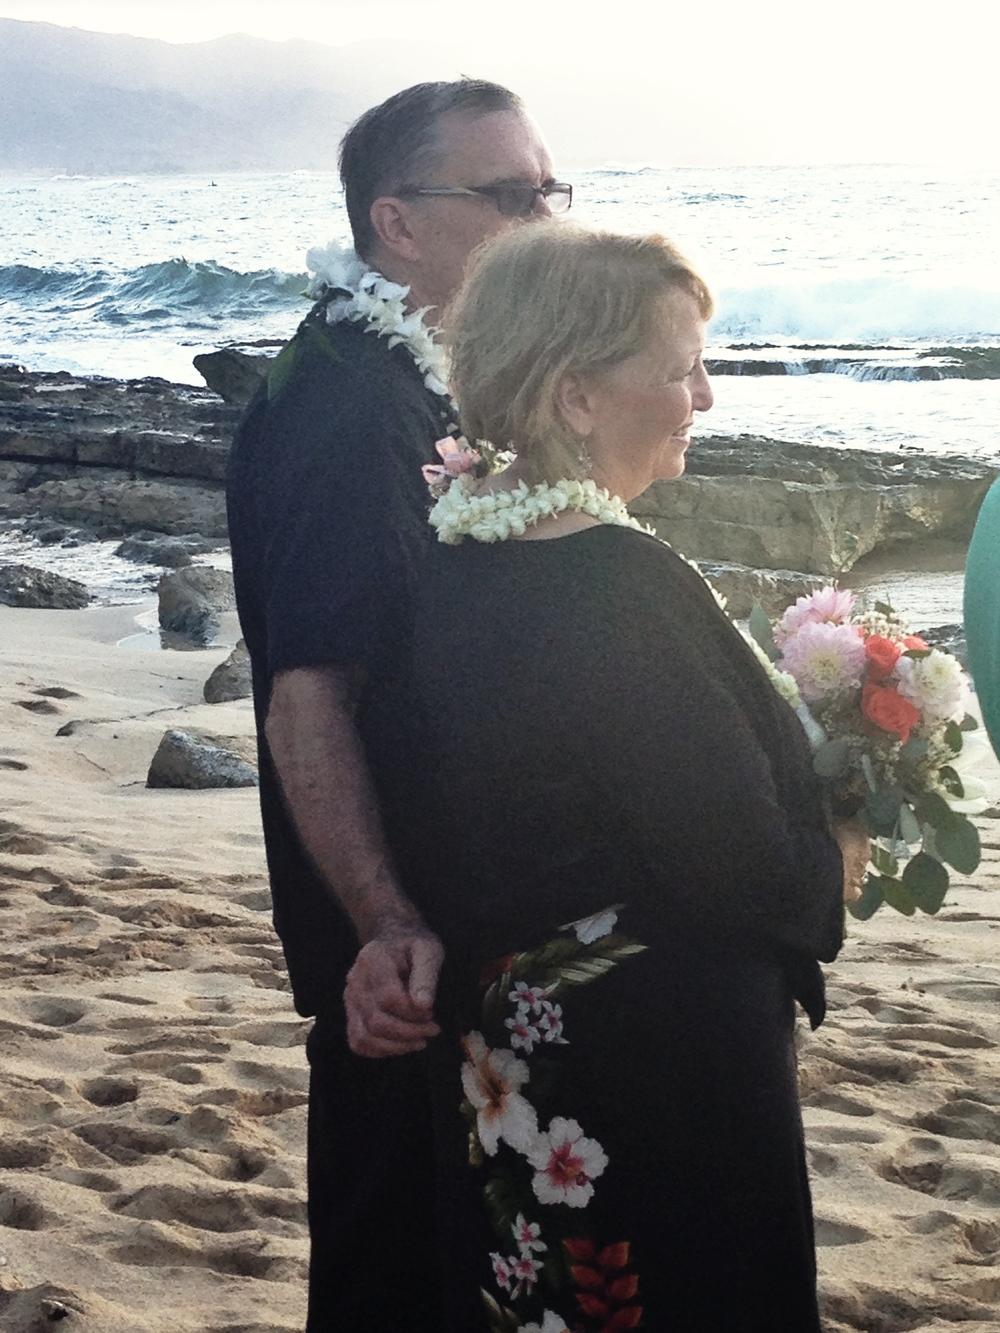 beach-north-shore-ceremony-parents